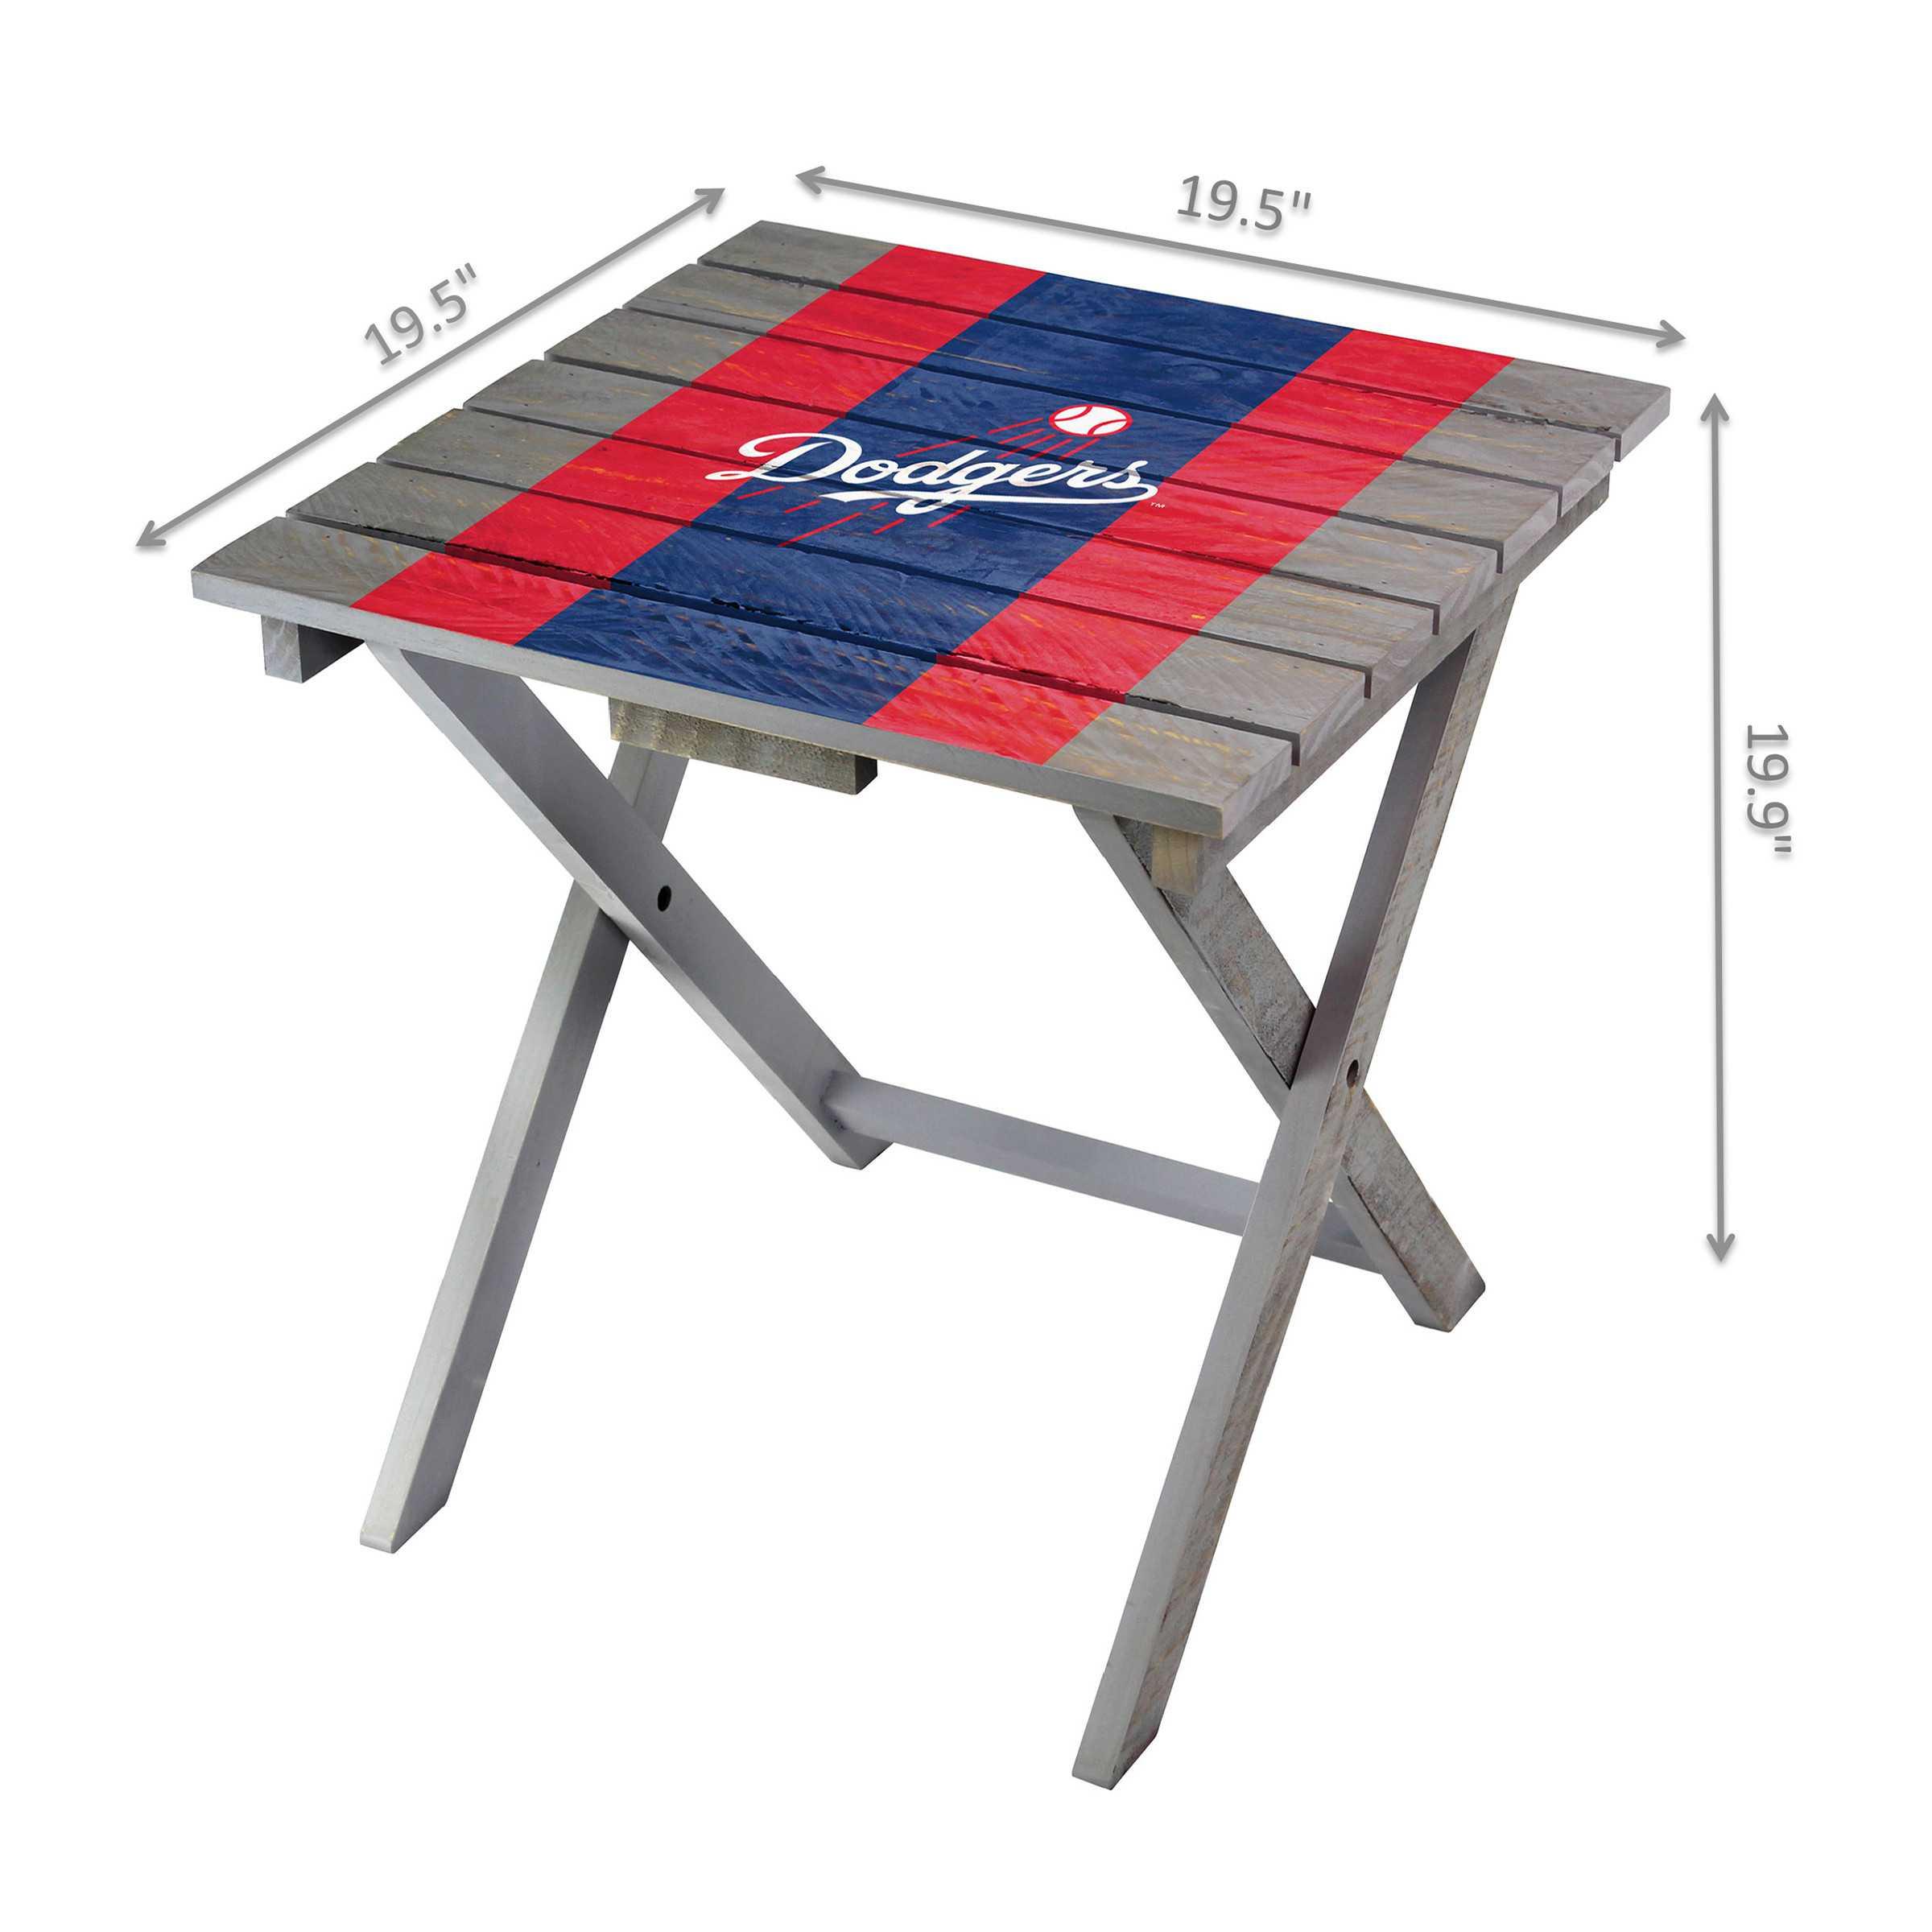 Los Angeles Dodgers Adirondack Folding Table